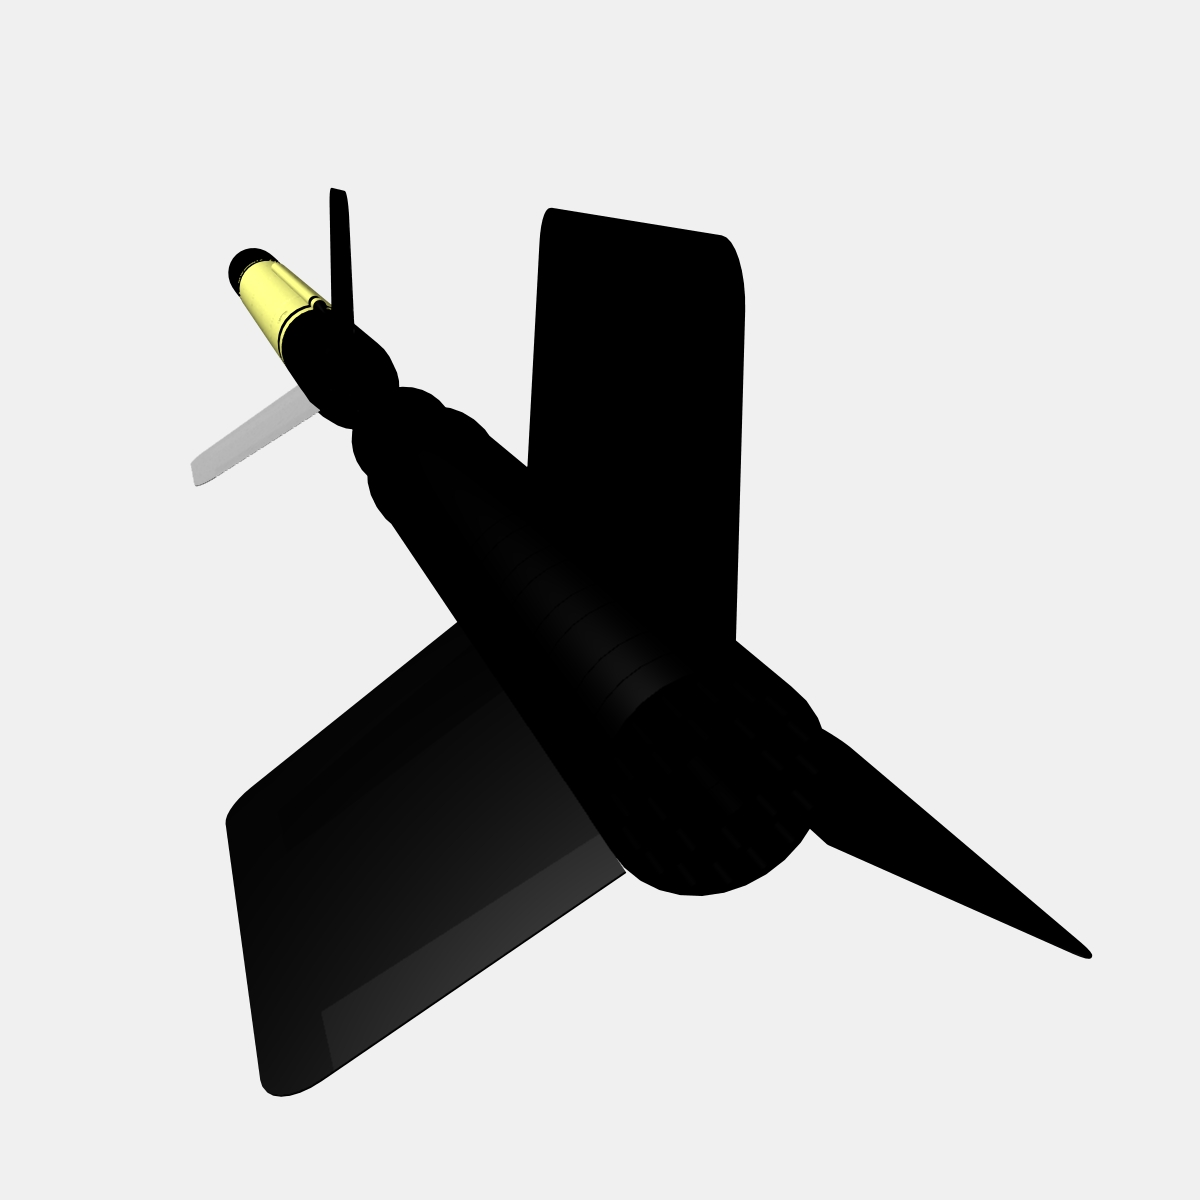 us wac corporal rocket 3d model 3ds dxf x cod scn obj 149612